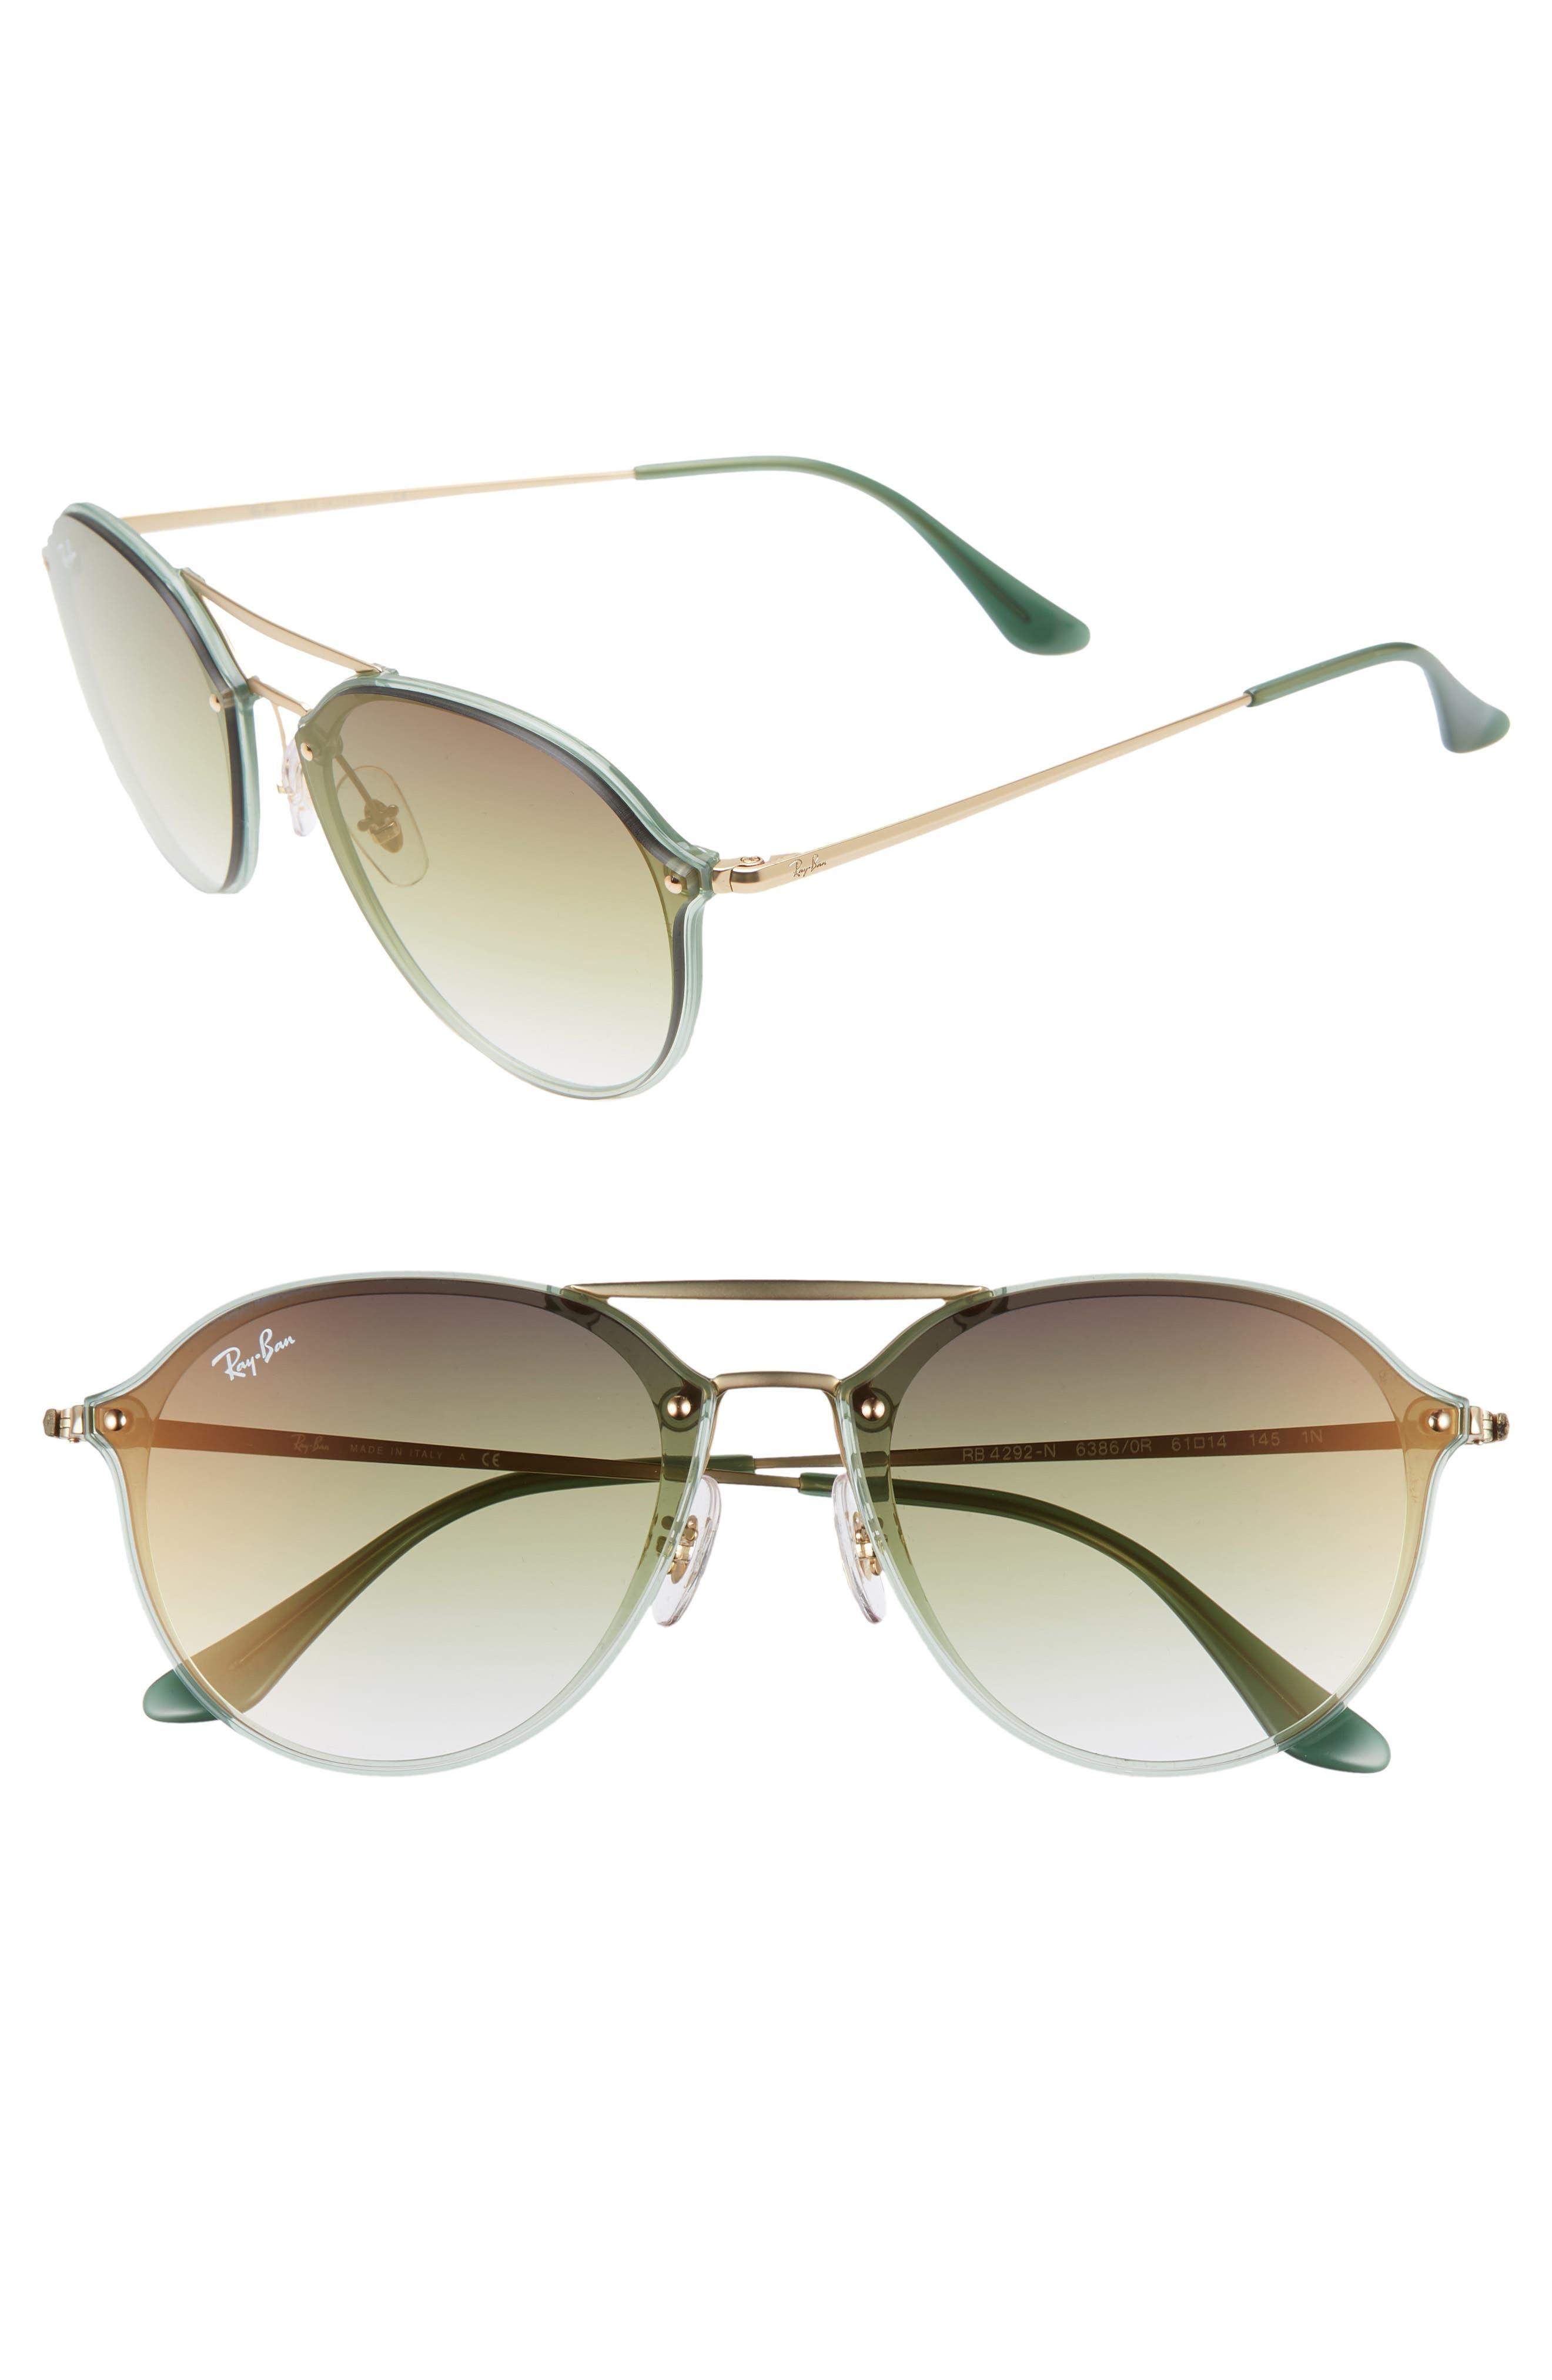 61mm Gradient Aviator Sunglasses,                             Main thumbnail 1, color,                             GREEN/ GOLD GRADIENT